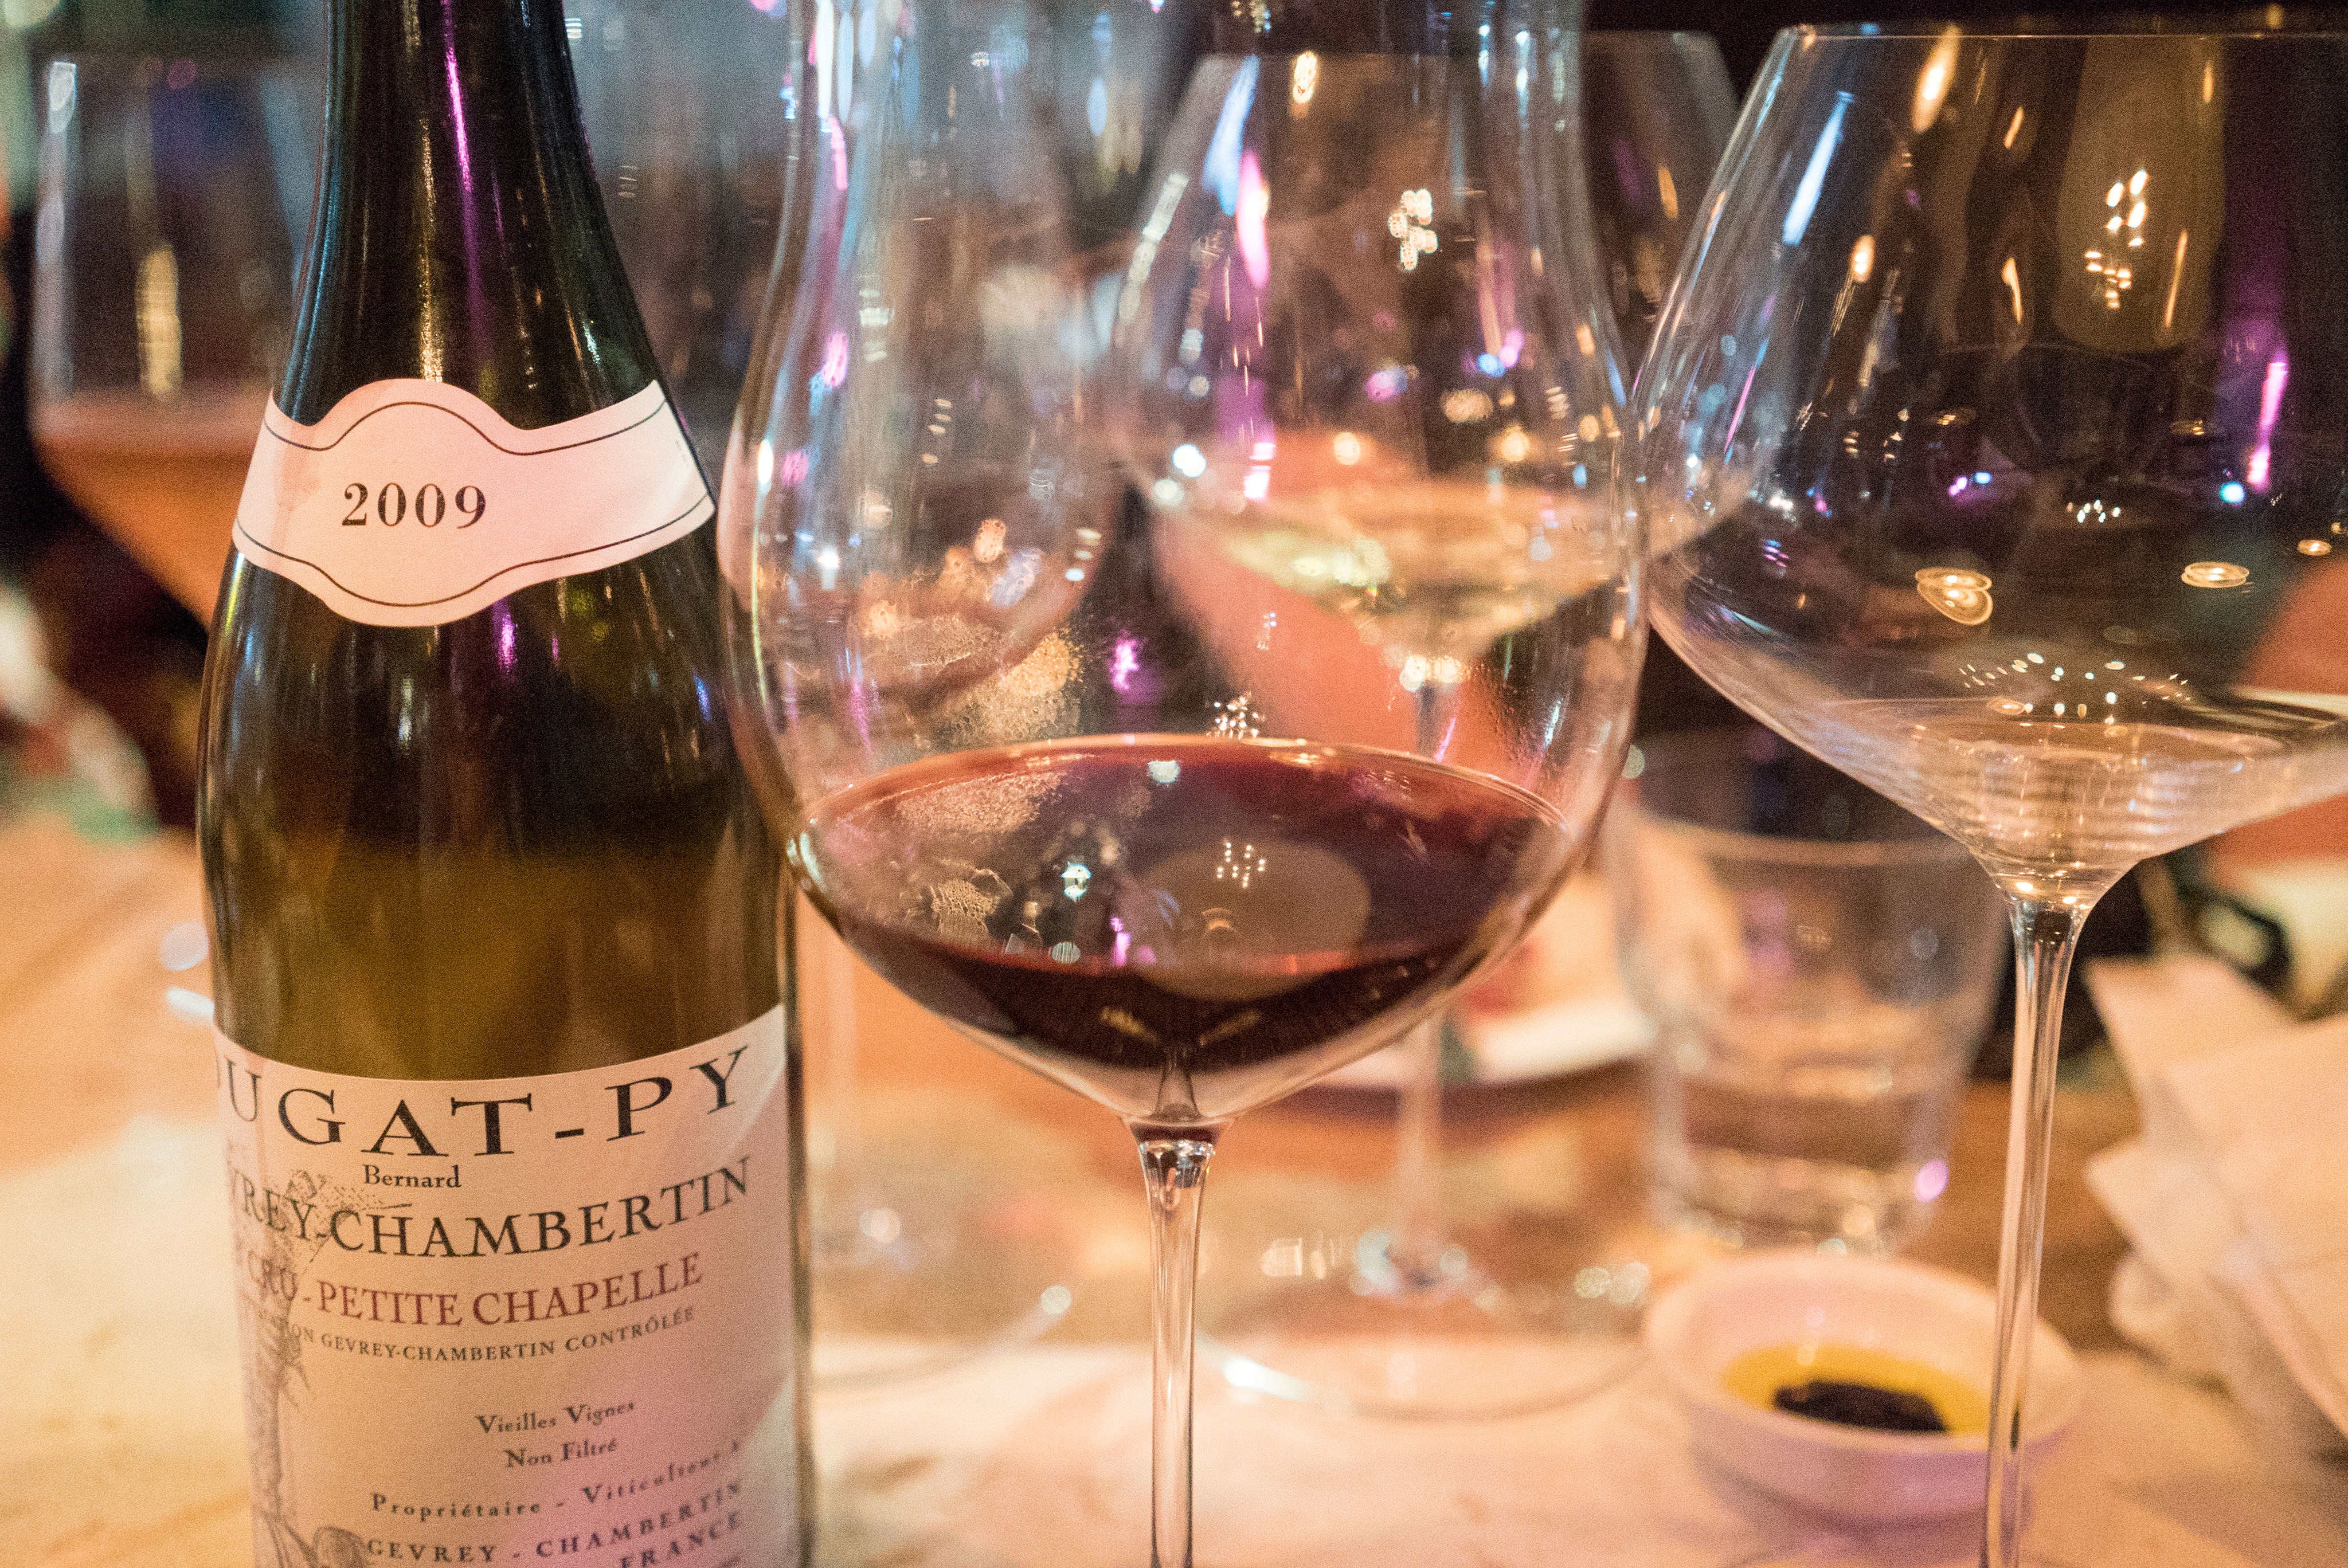 Domaine Dugat-Py Gevrey-Chambertin Premier Cru Vieilles Vignes 2009